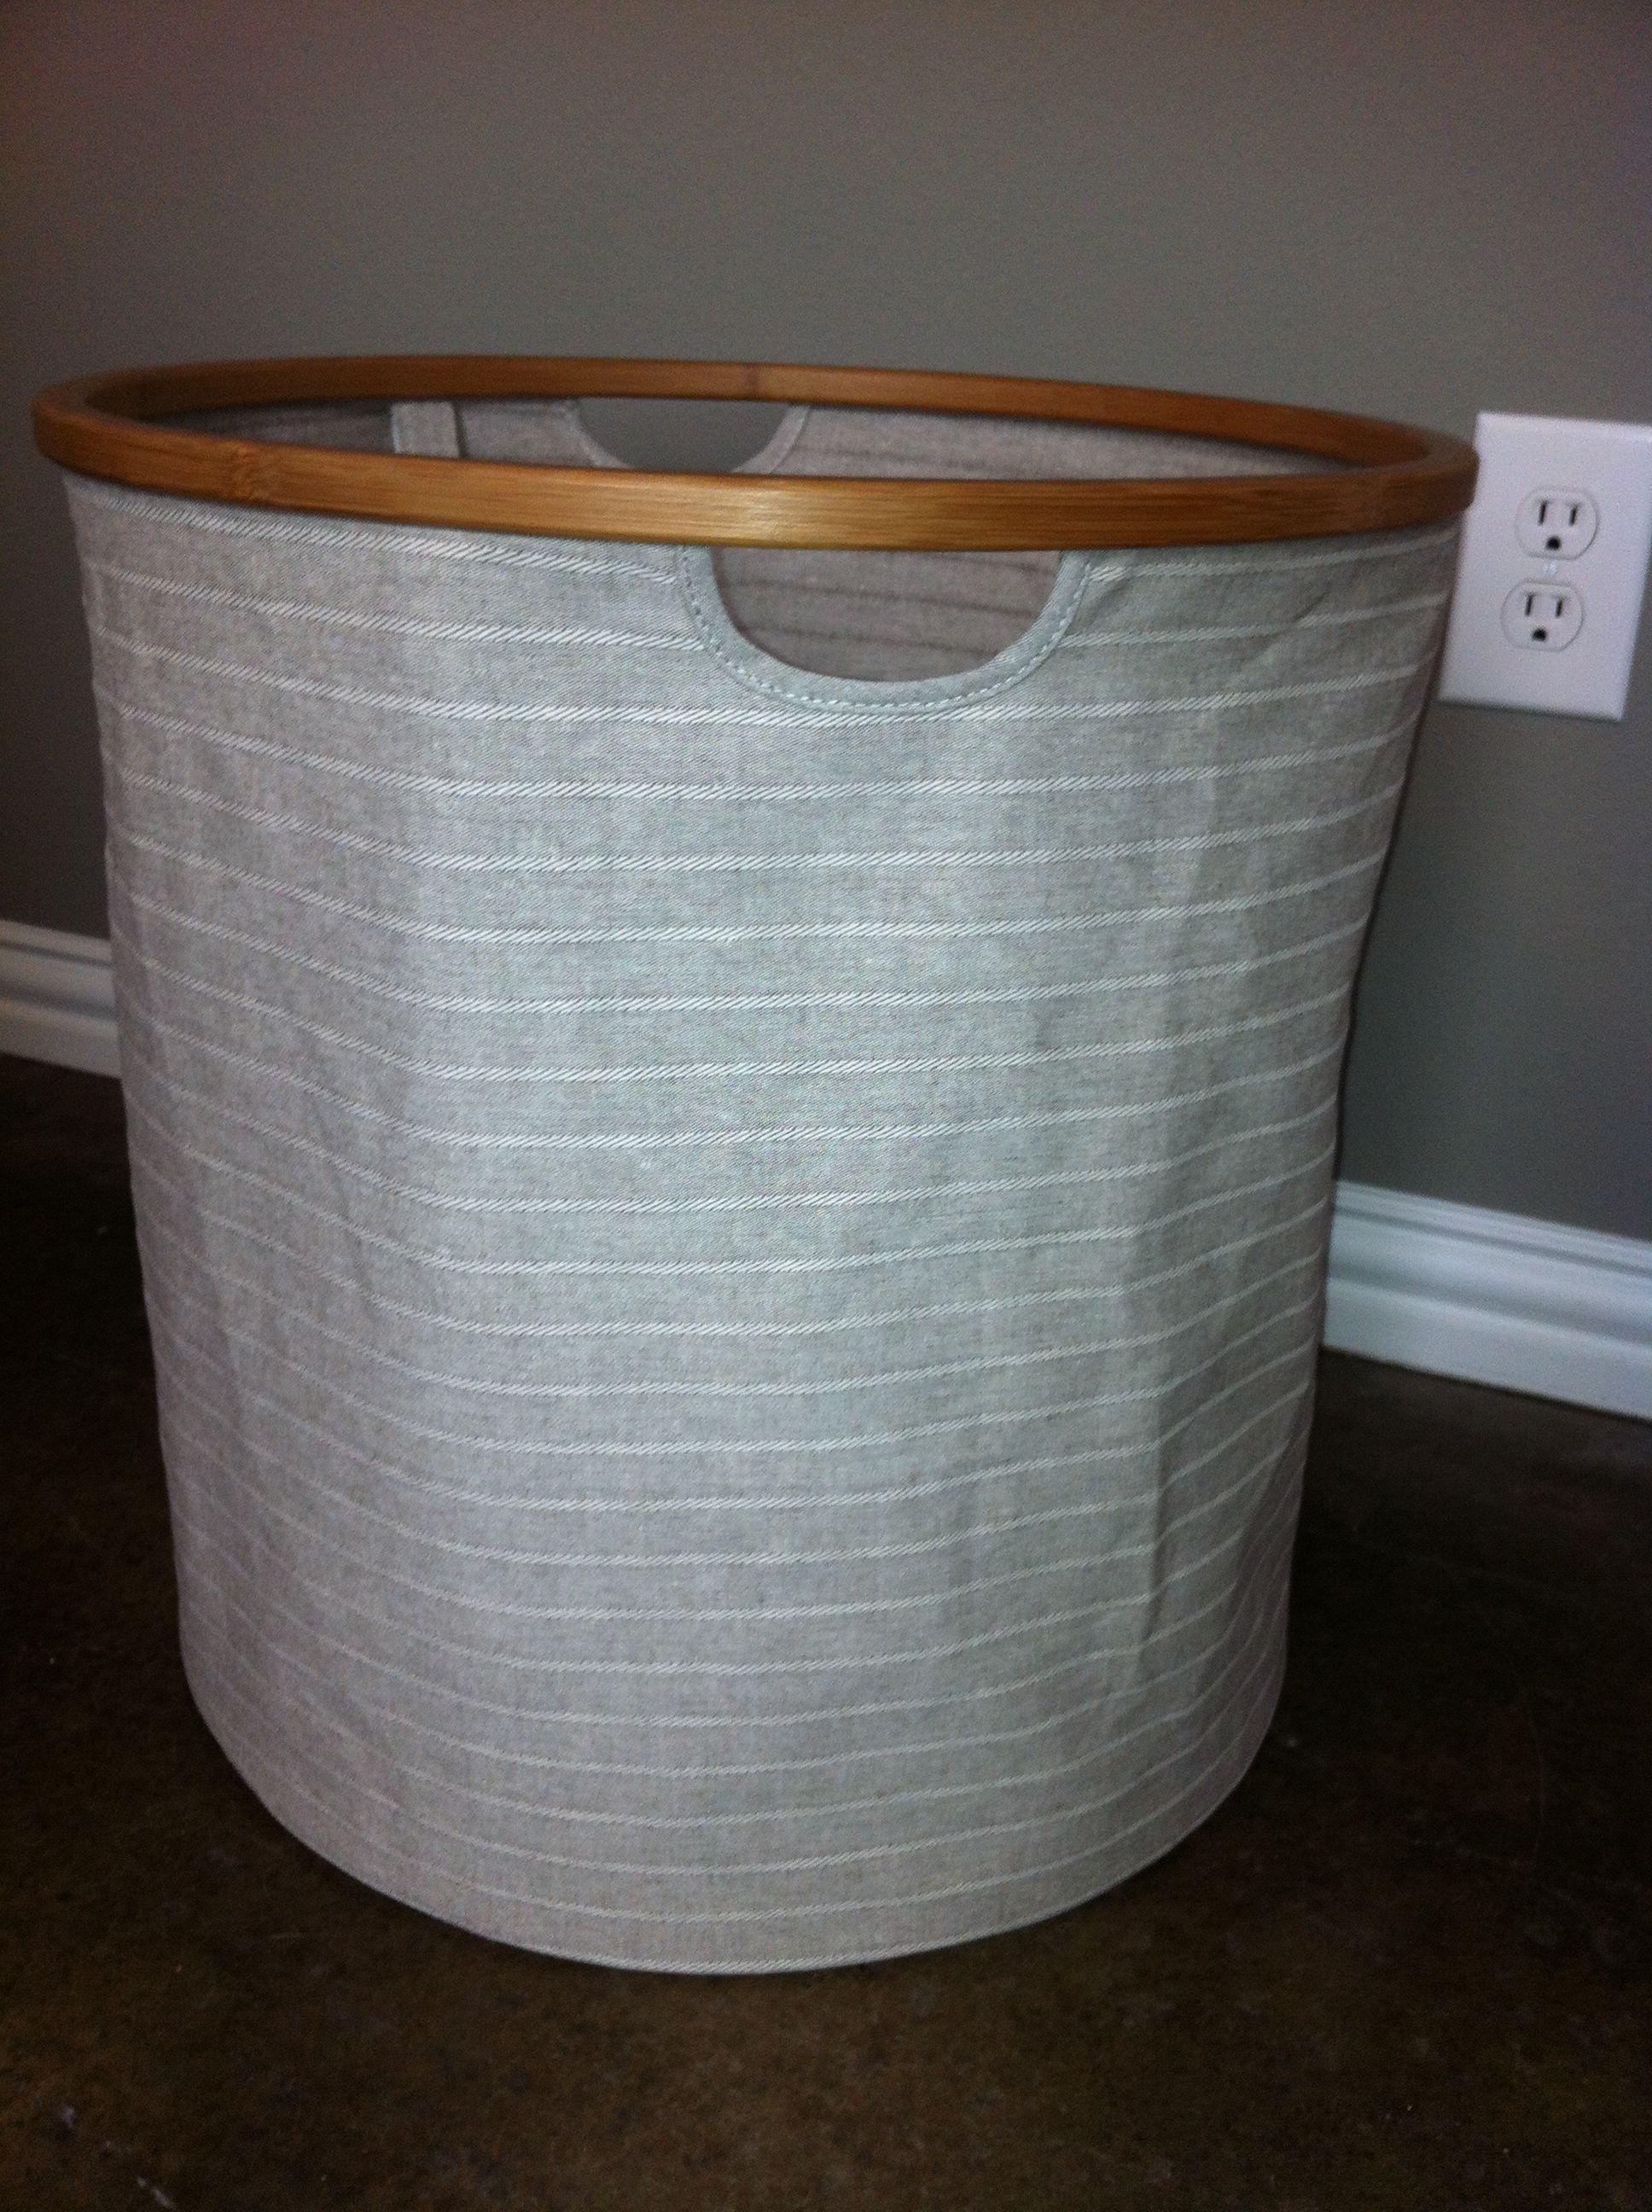 Laundry Hamper From Home Goods Score Laundry Hamper Home